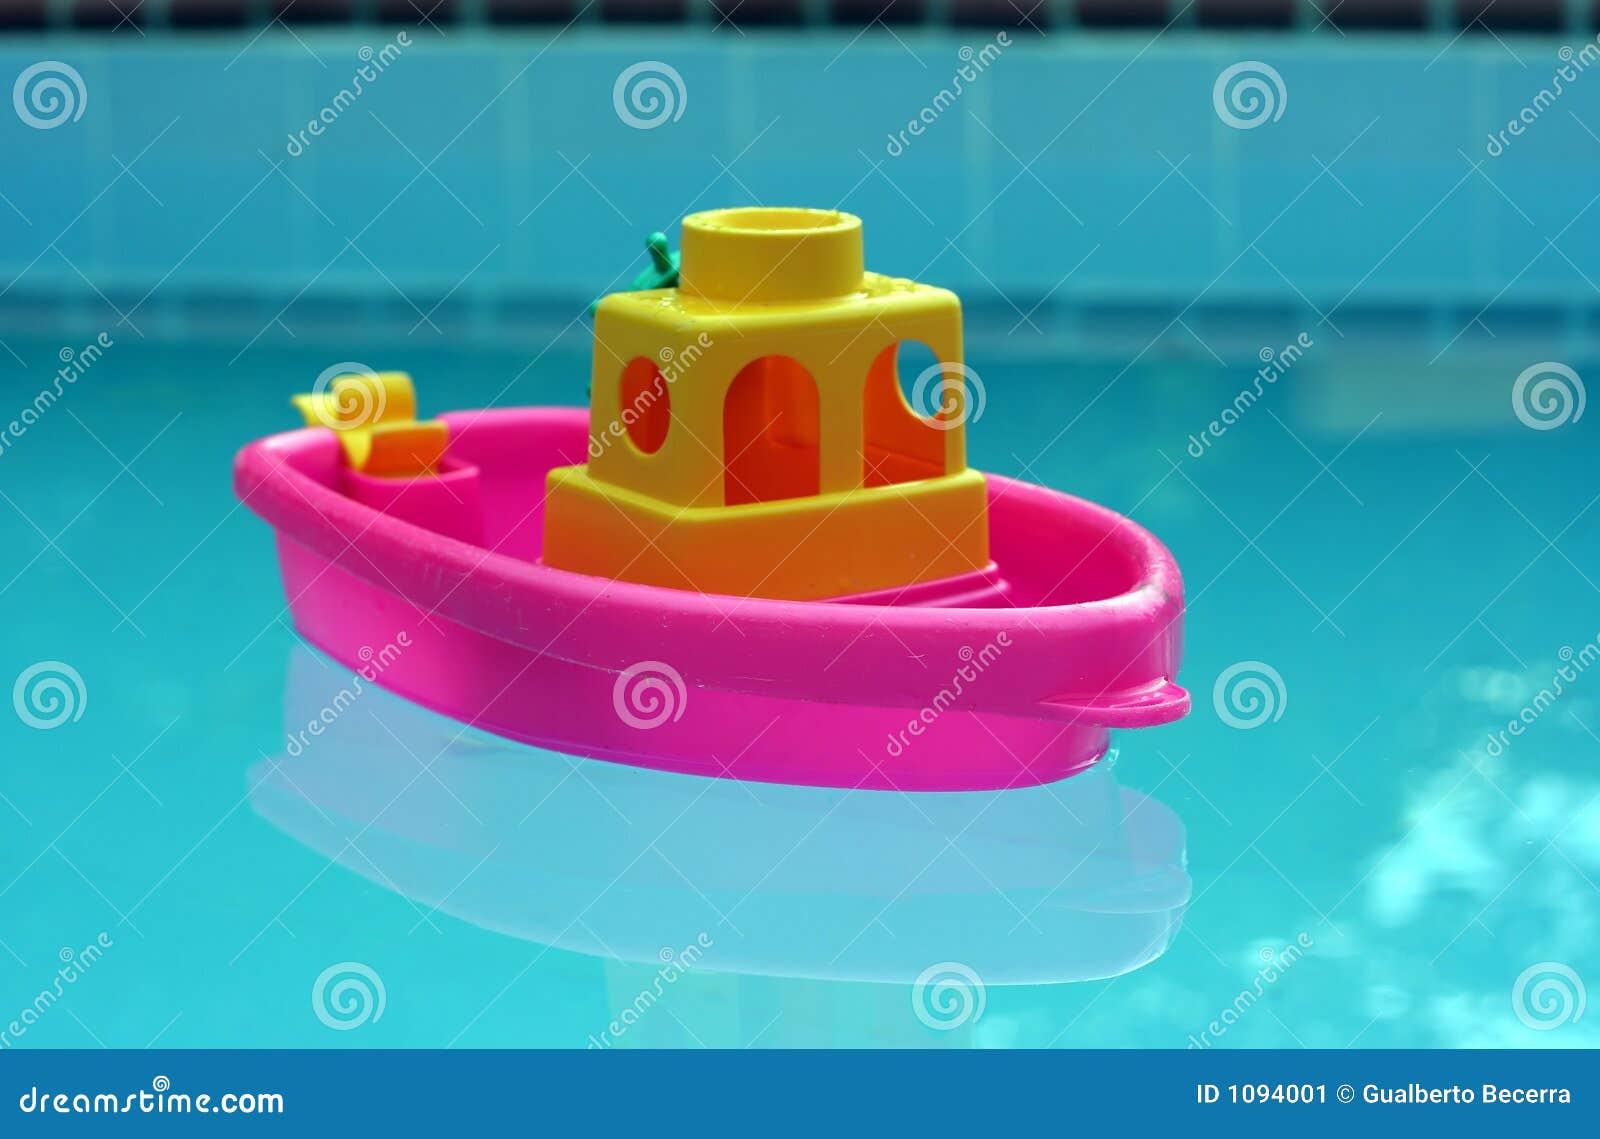 Toy Boat Stock Image - Image: 1094001